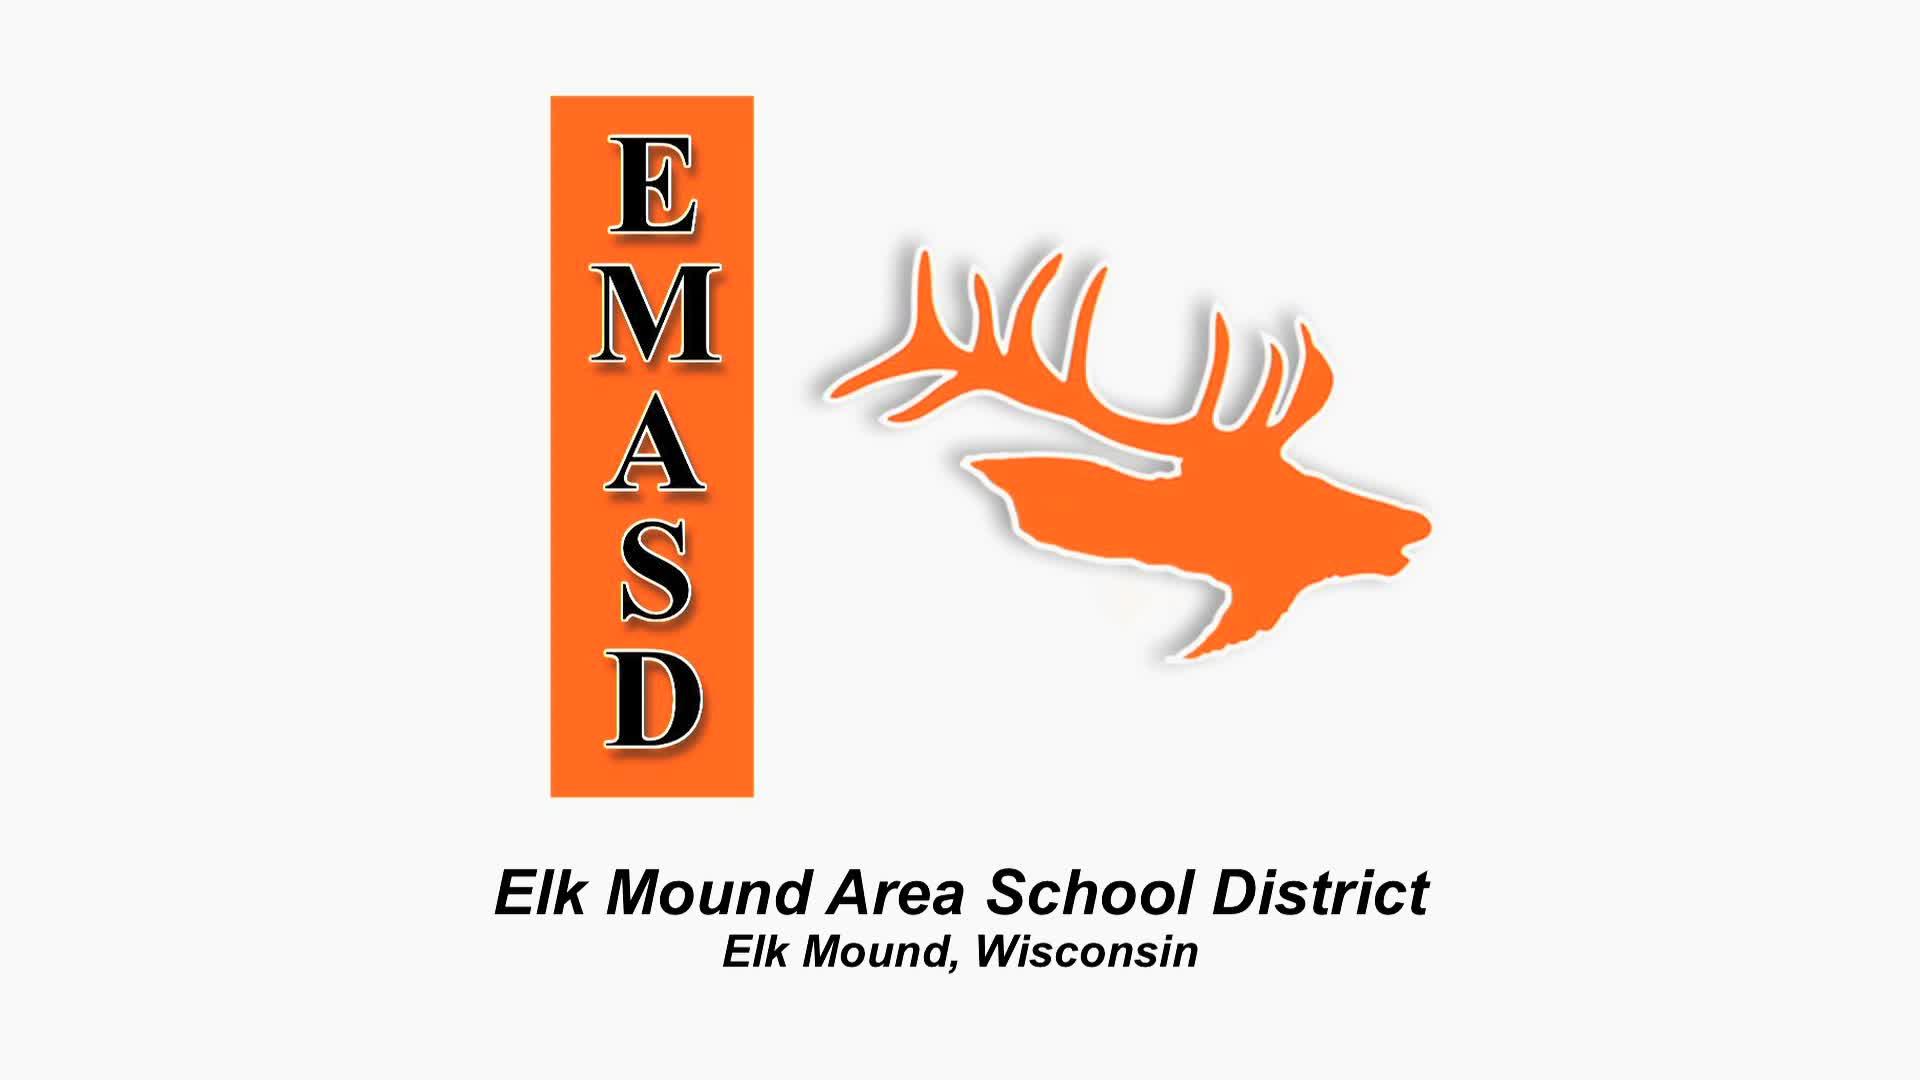 Elk Mound Area School District Informational Video...